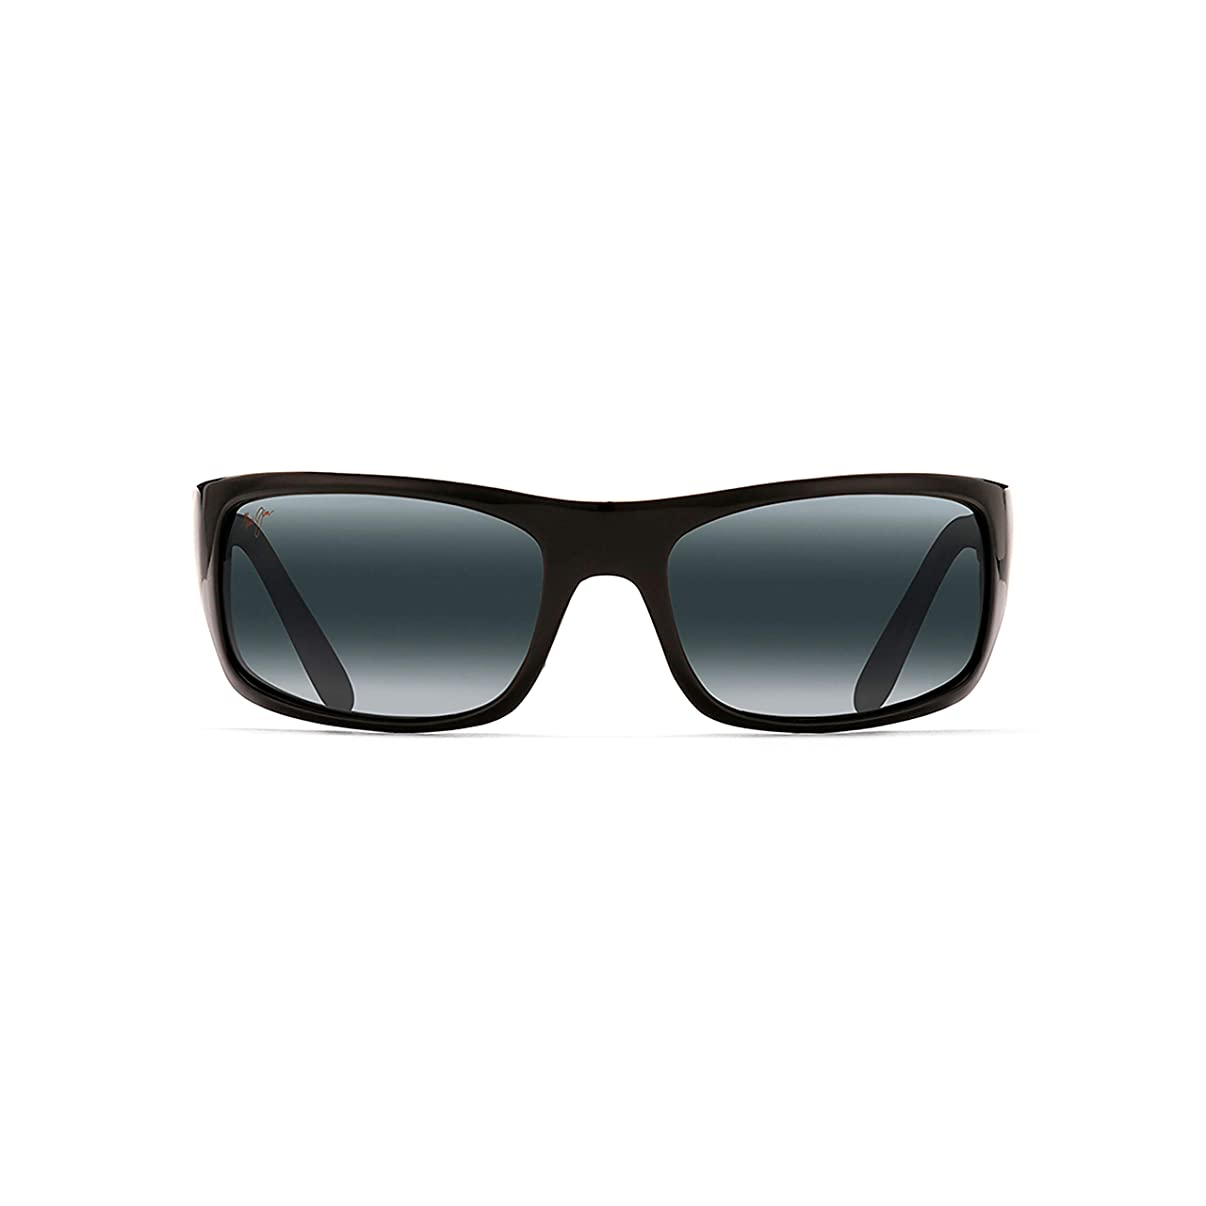 Maui Jim North Star Polarized Matte Silver Classic Frame Sunglasses